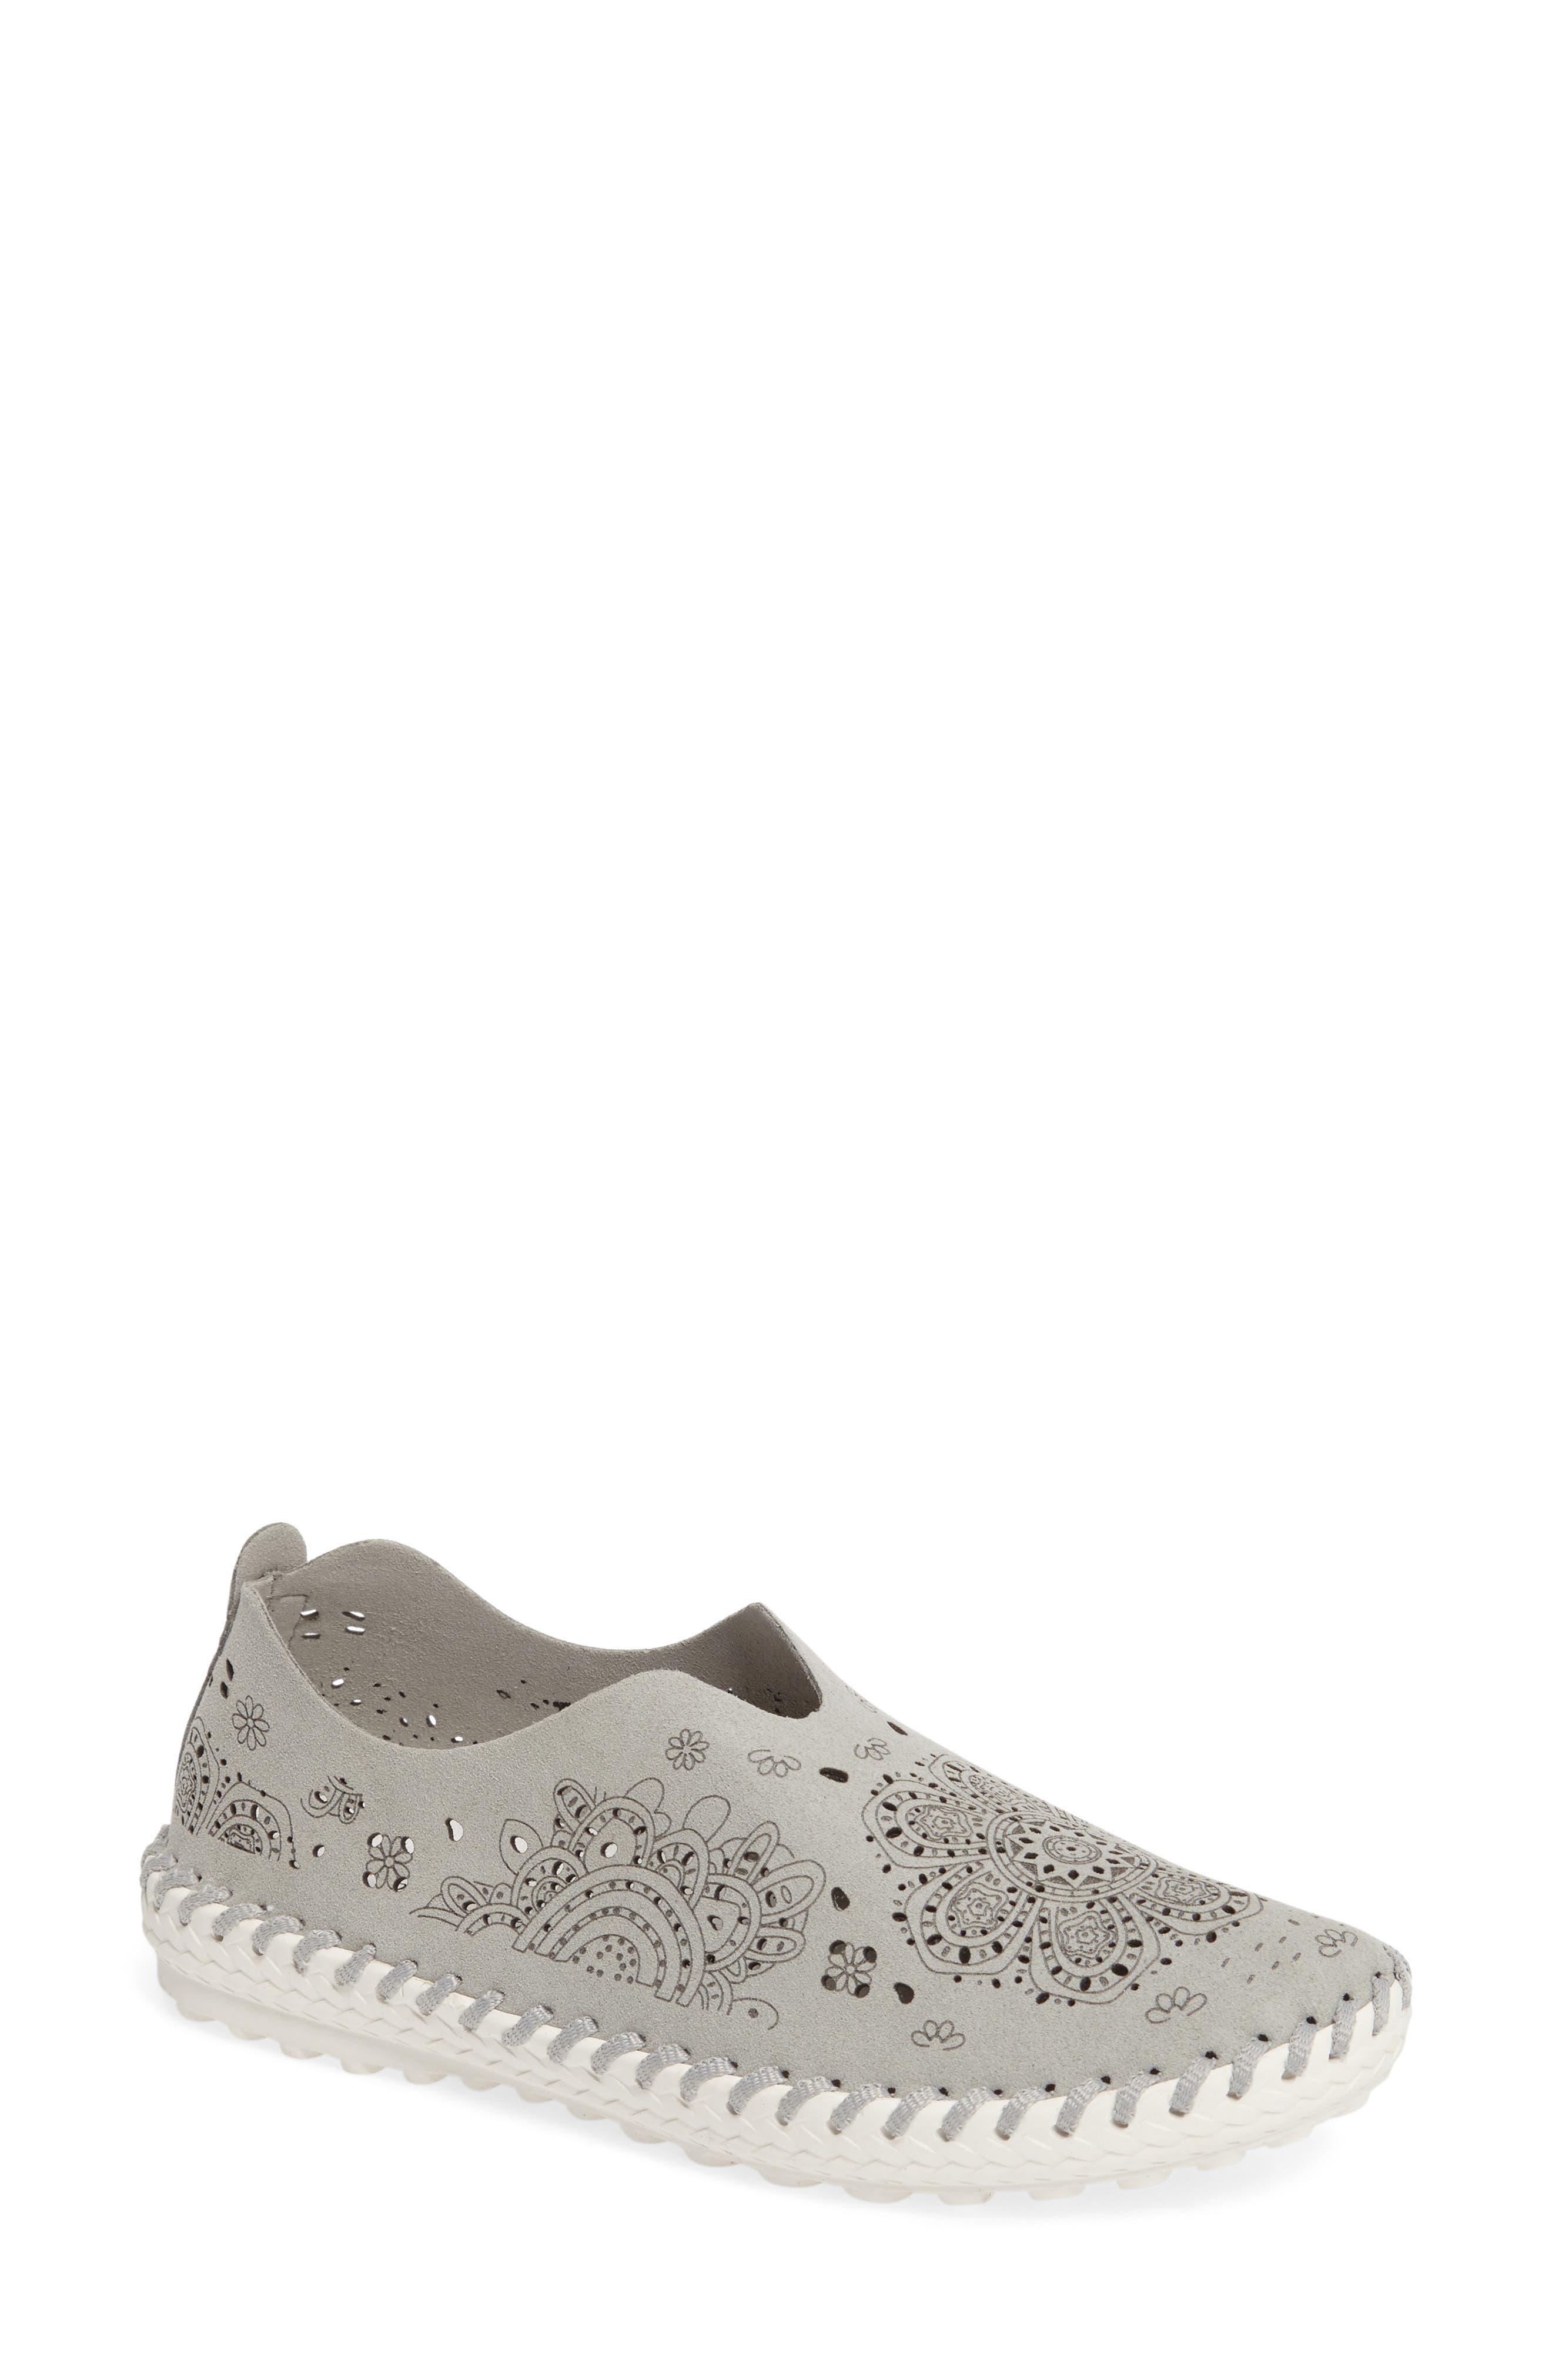 TW09 Slip-On Sneaker,                         Main,                         color, Light Grey Leather